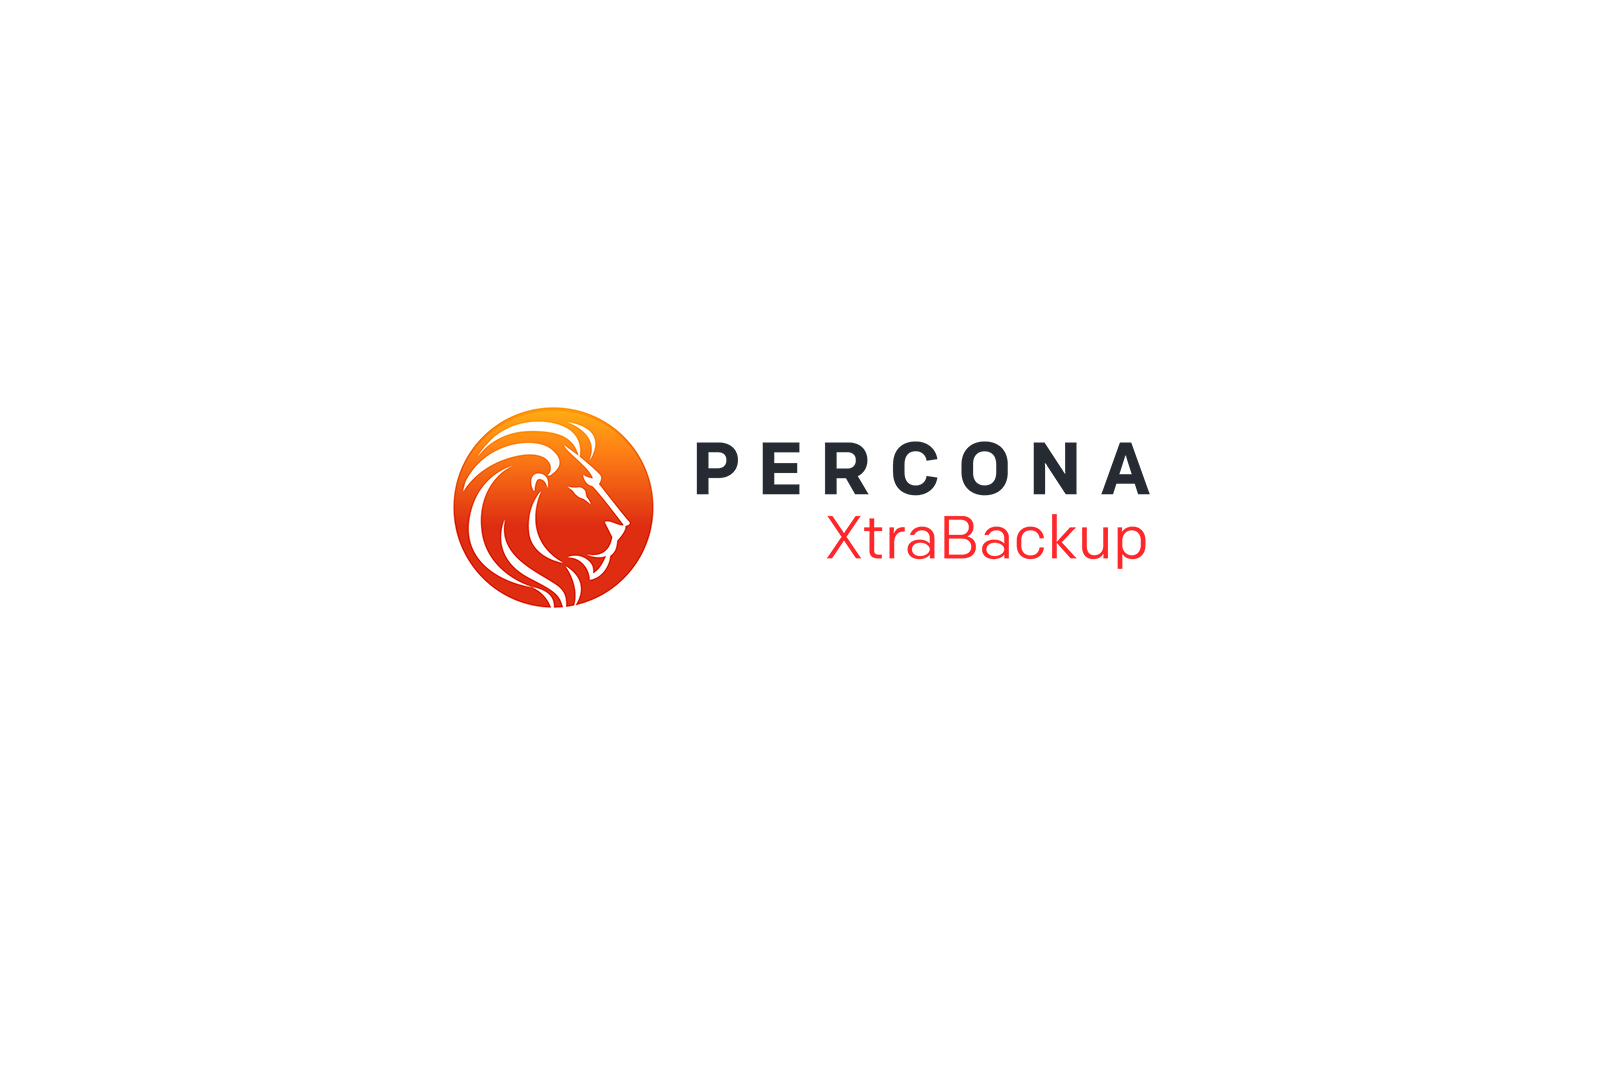 Create Hot Backups of MySQL Databases with Percona